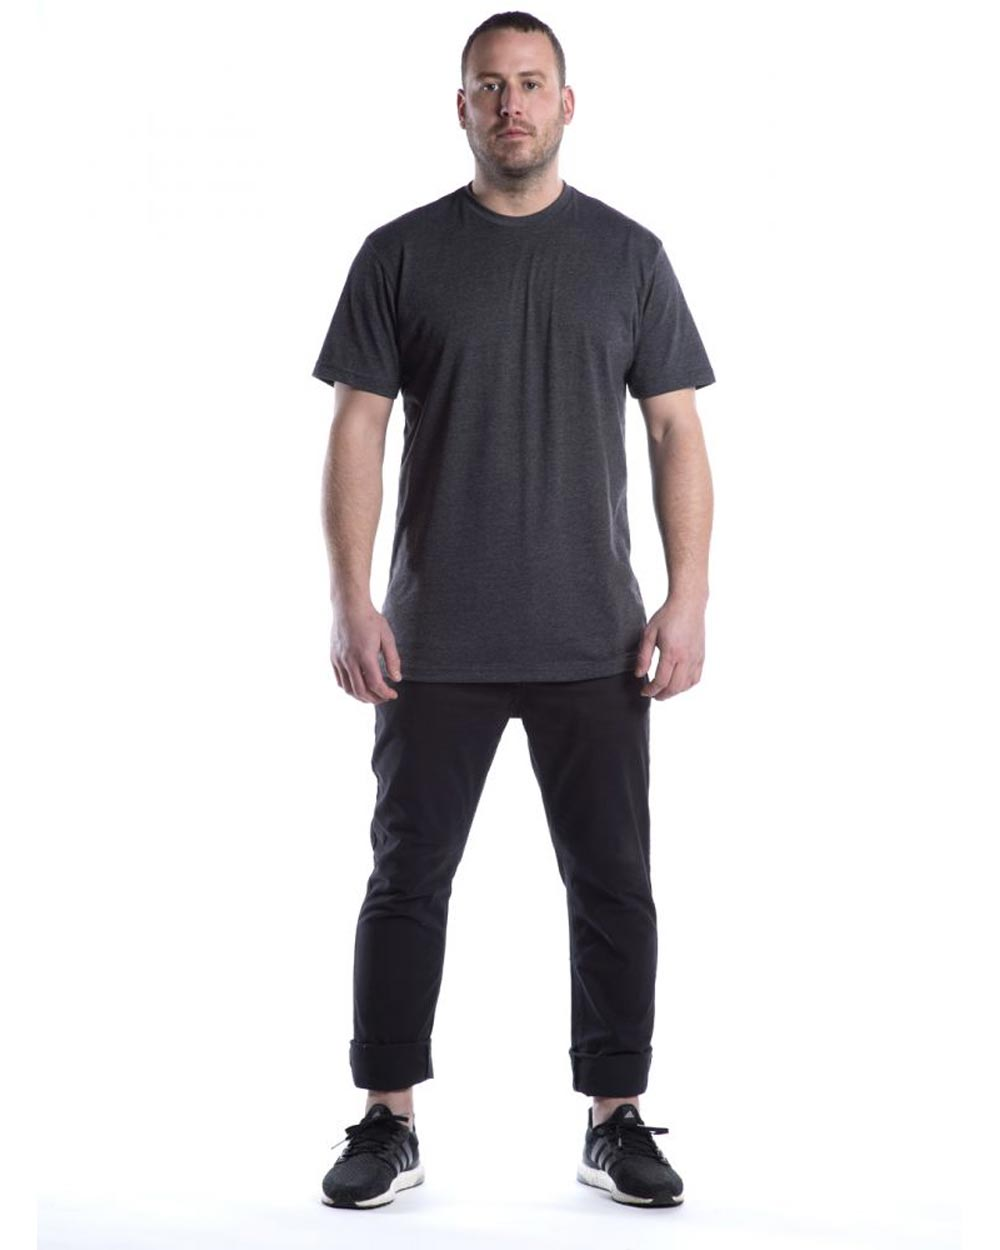 HS Apparel Men's T-Shirt